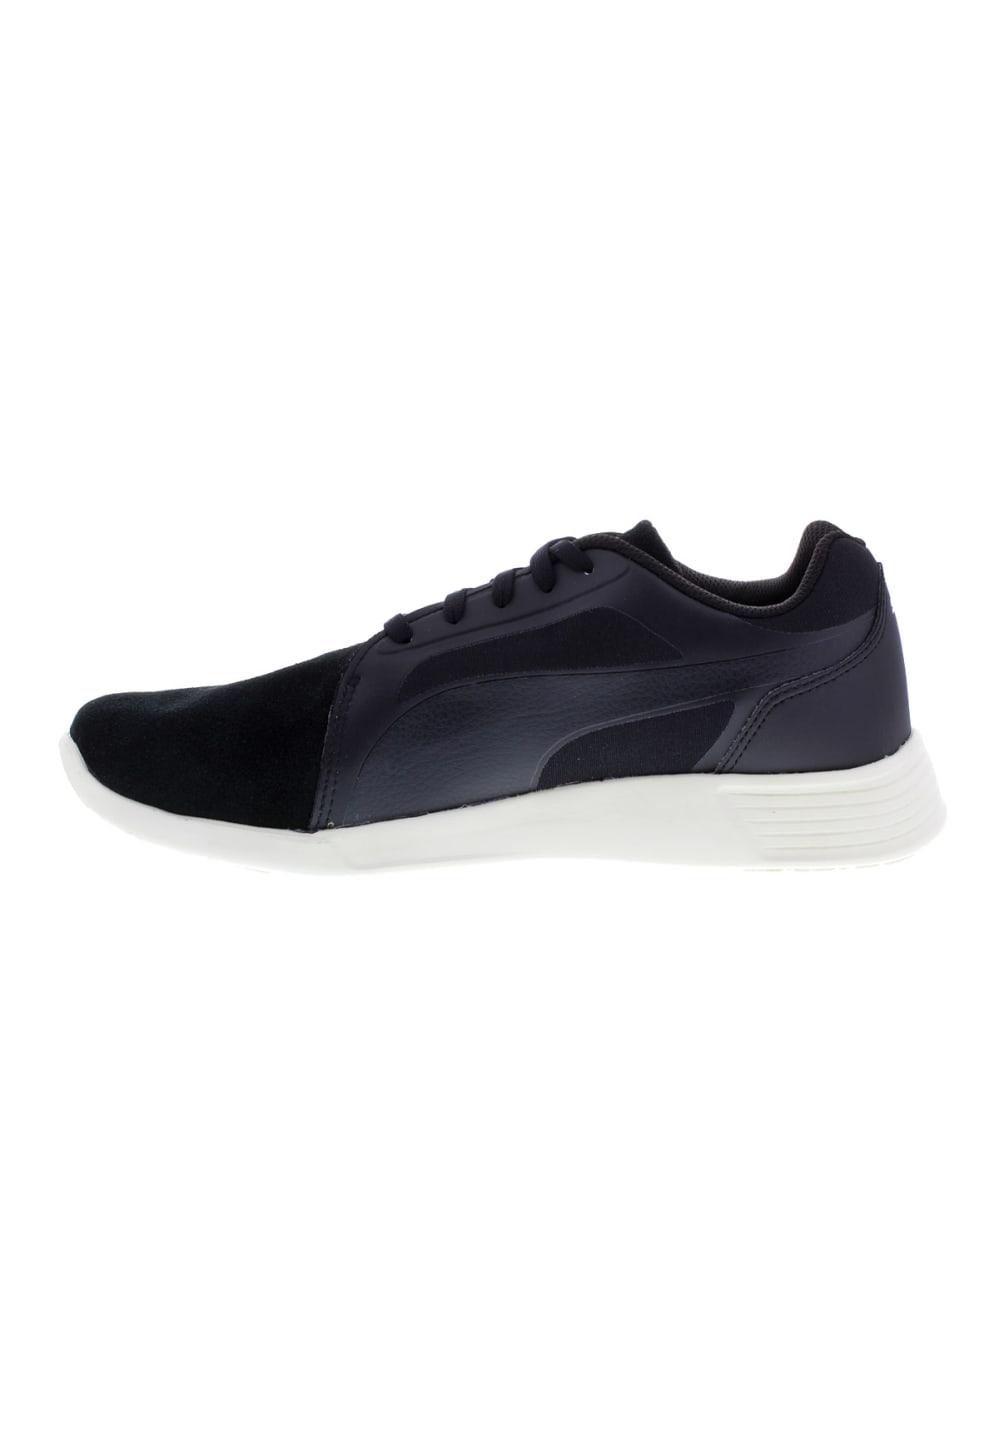 b37dcc28d2285 Puma ST Trainer Evo SD - Sneaker - Black